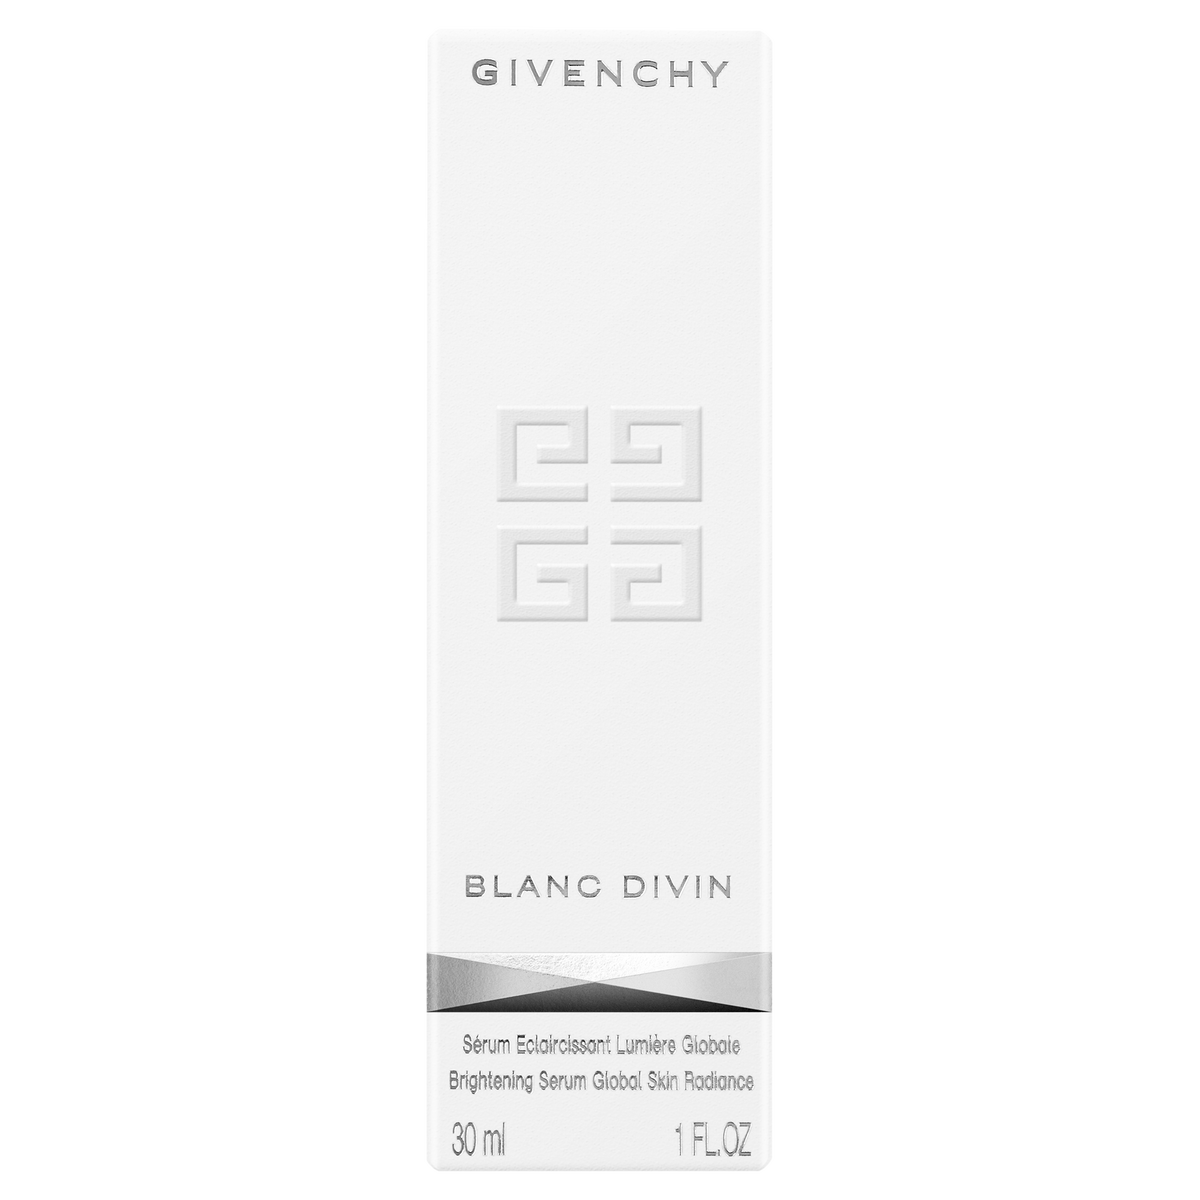 BLANC DIVIN